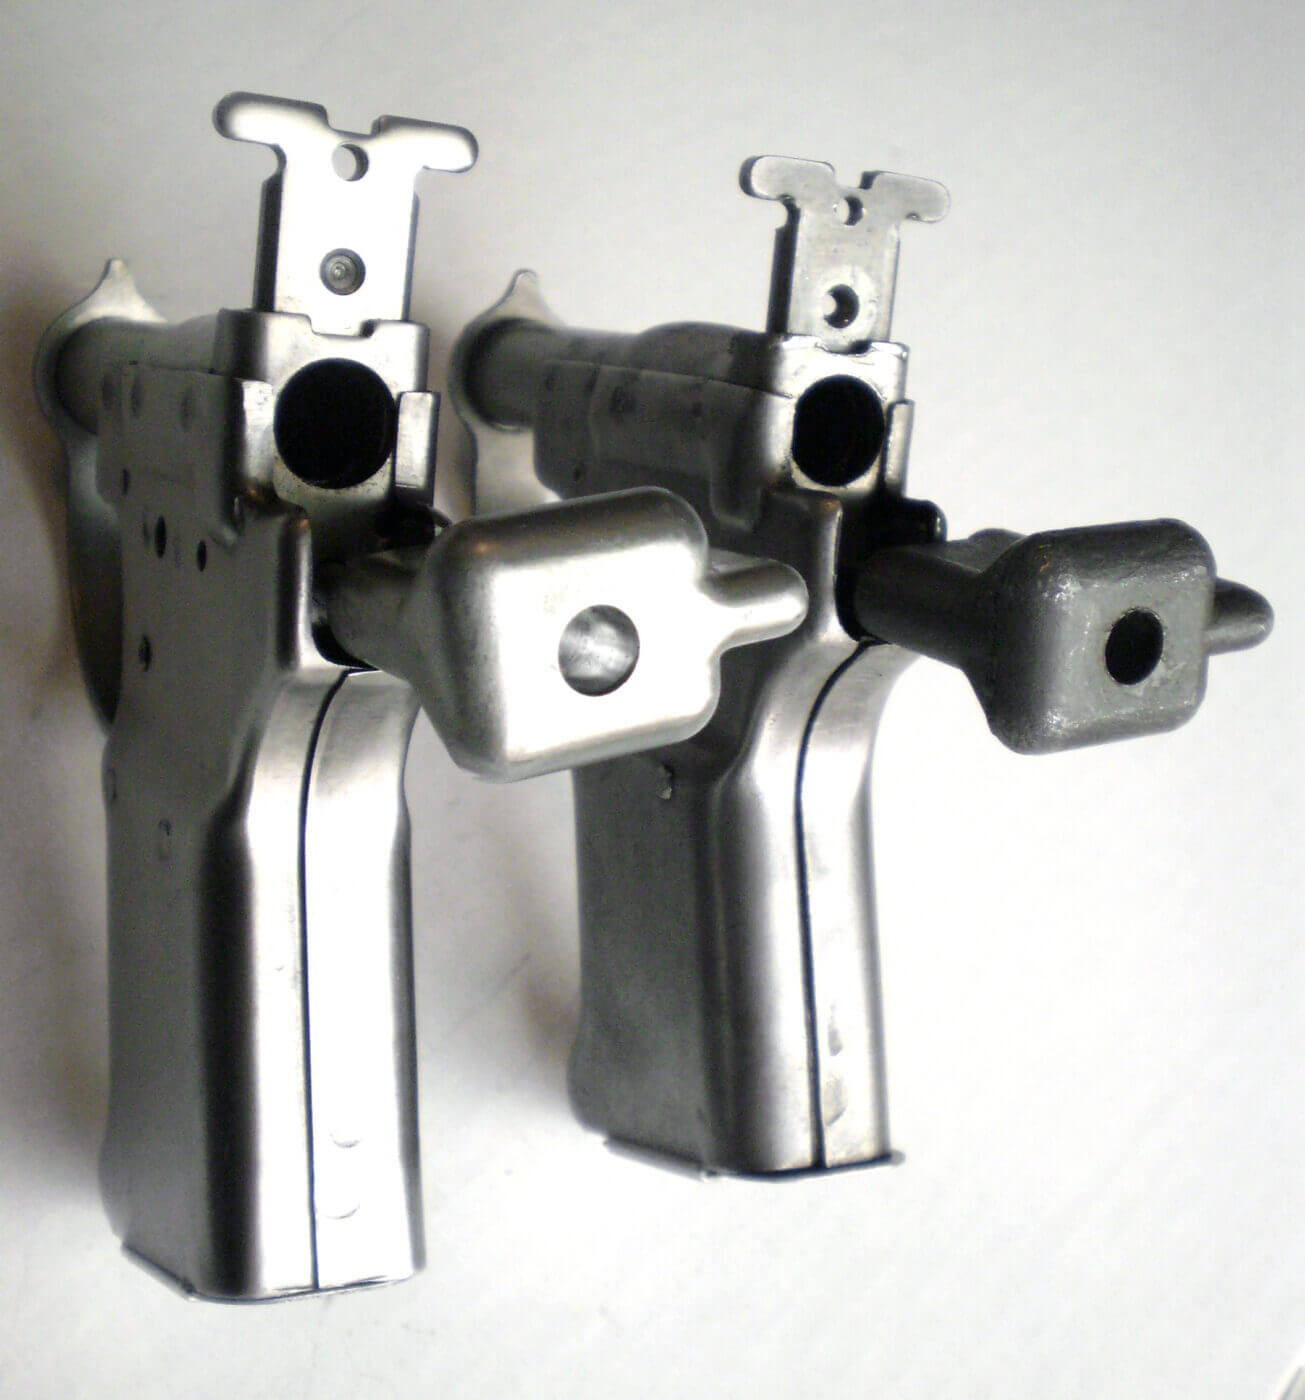 Loading the Liberator pistol